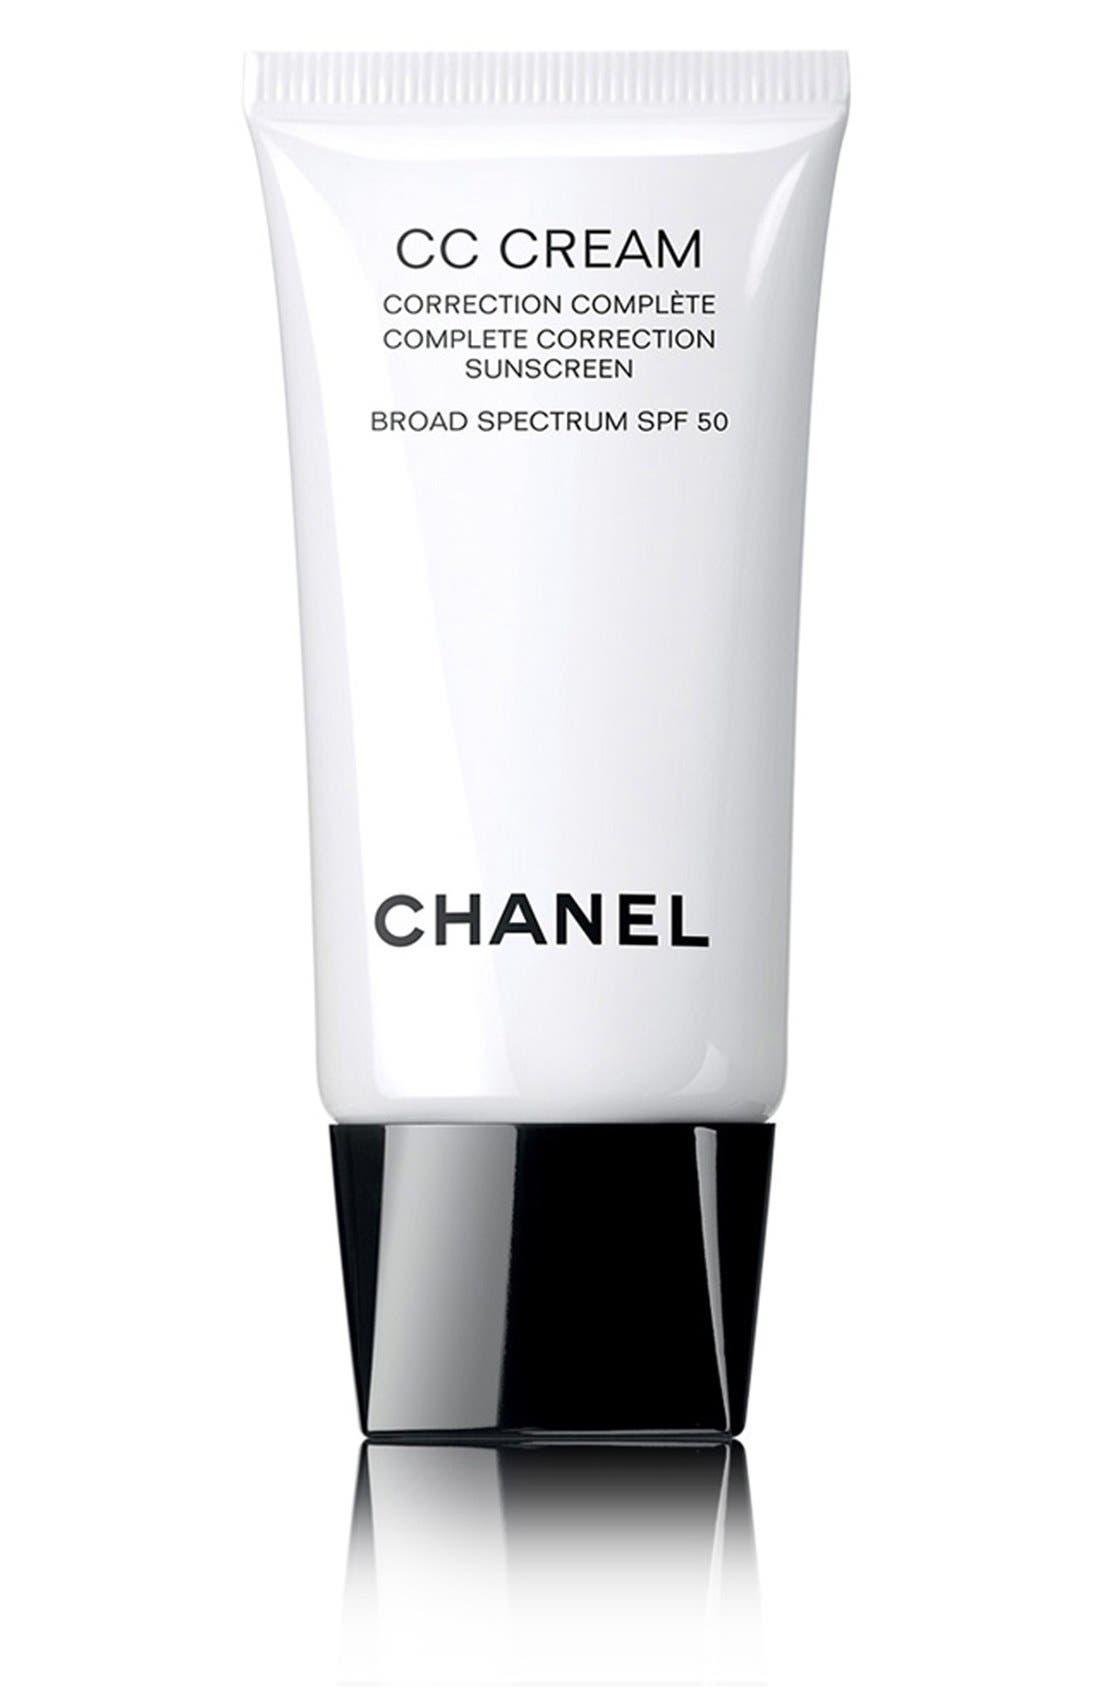 CC CREAM<br />Complete Correction Sunscreen Broad Spectrum SPF 50,                             Main thumbnail 1, color,